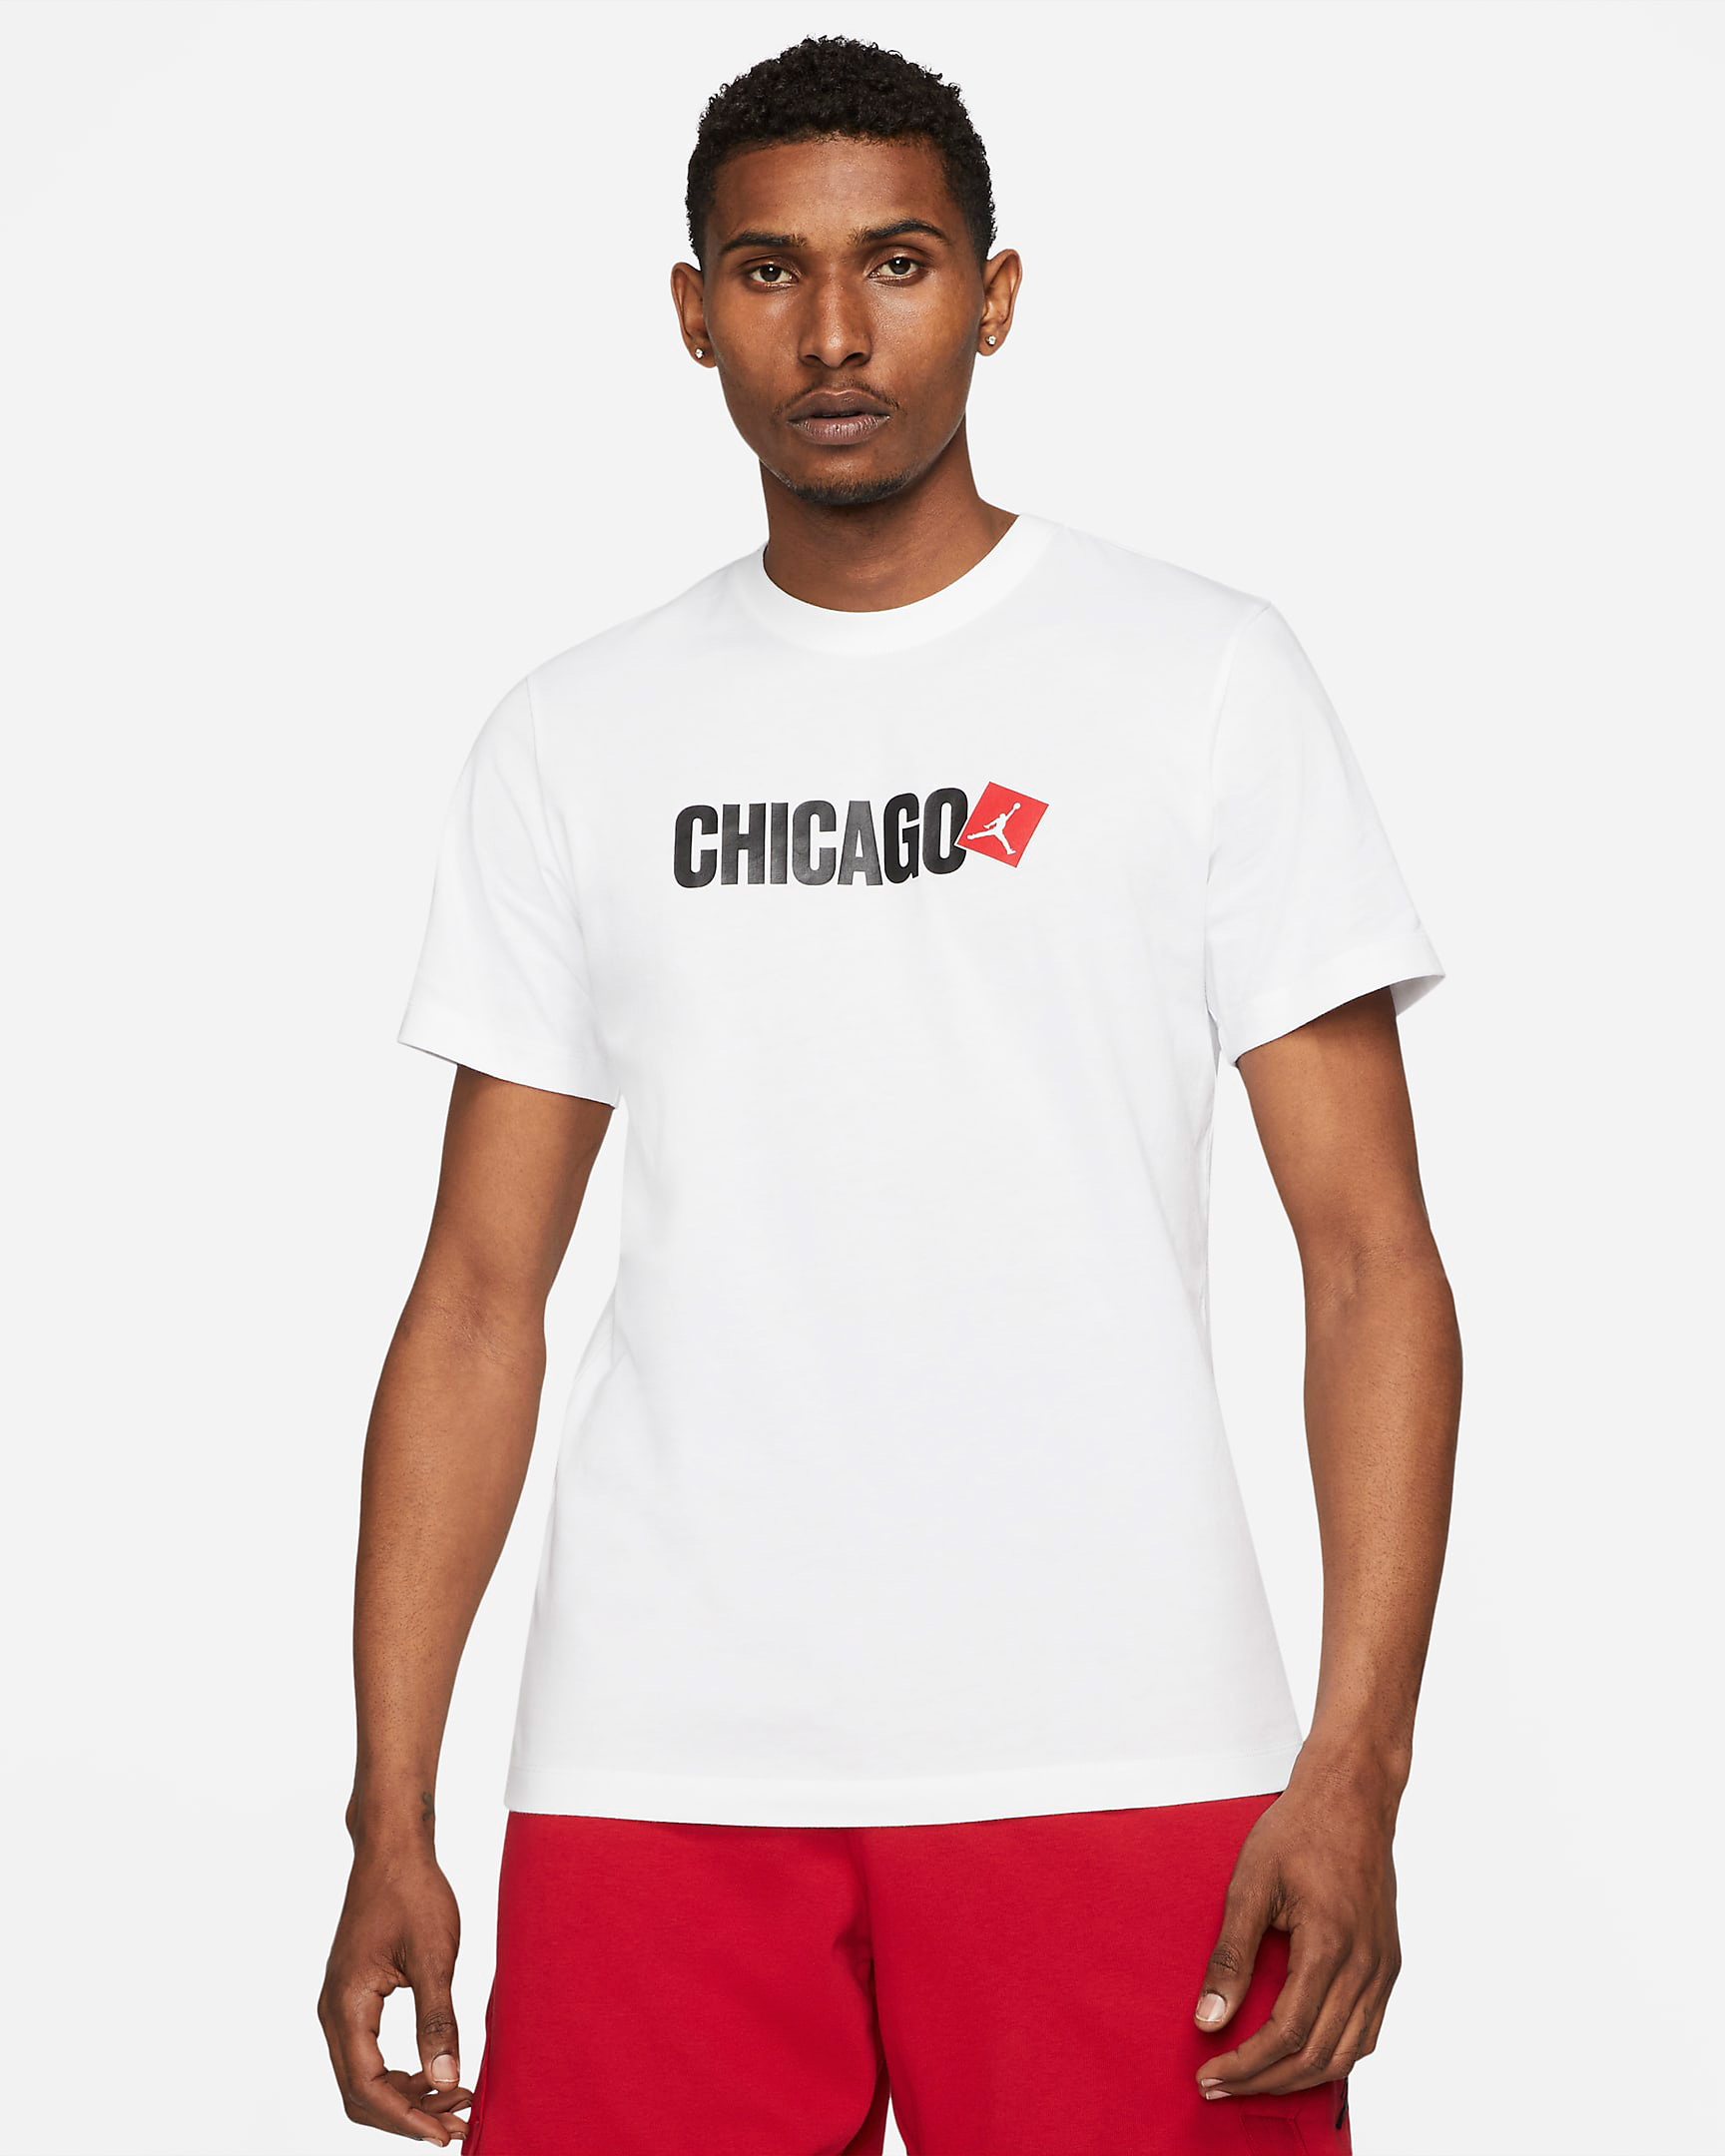 jordan-los-angeles-shirt-white-2